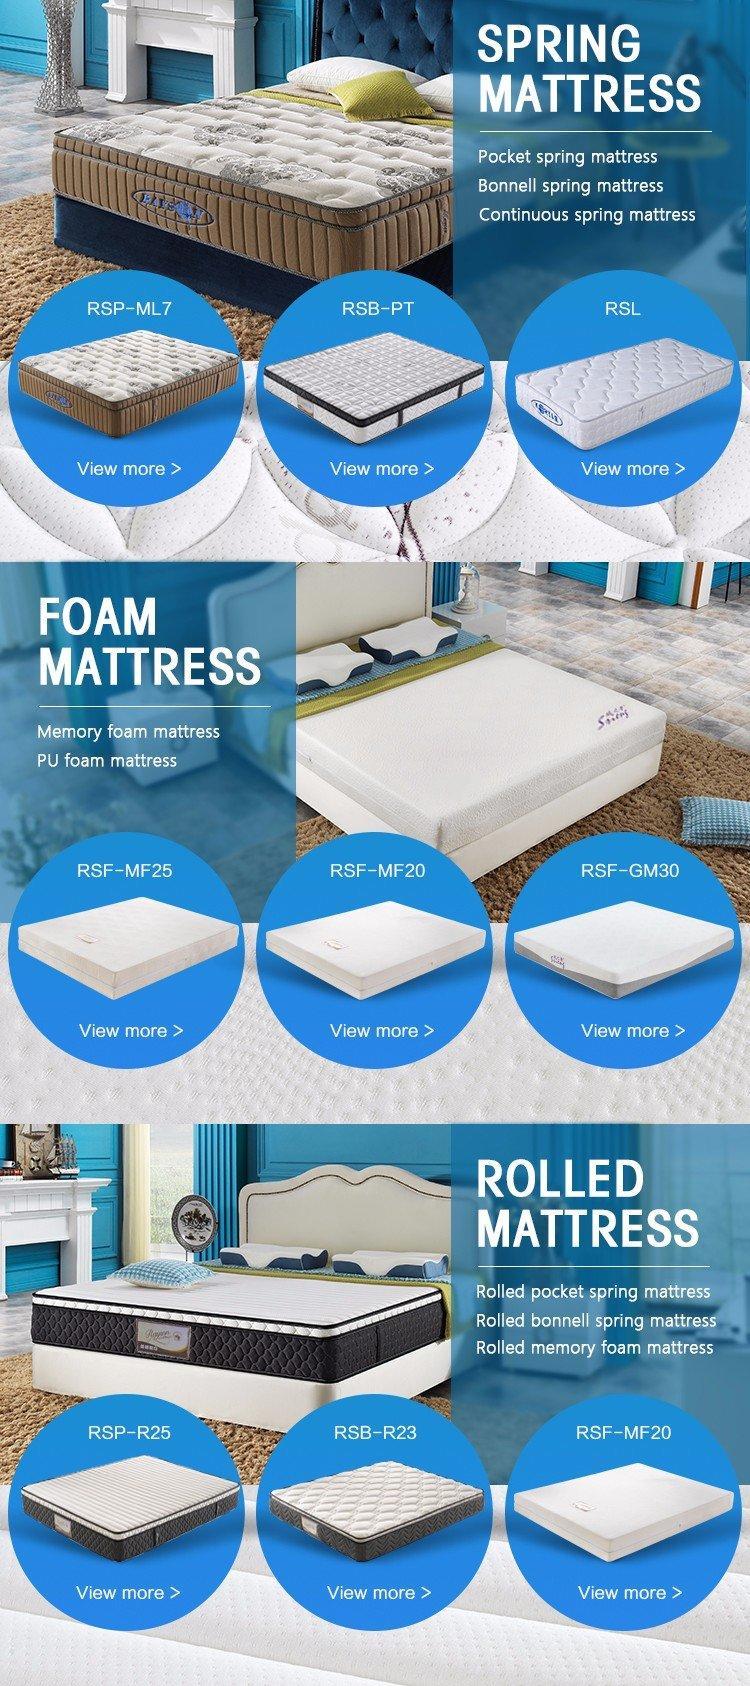 ciol beach top 10 pocket sprung mattress home Rayson Mattress Brand company